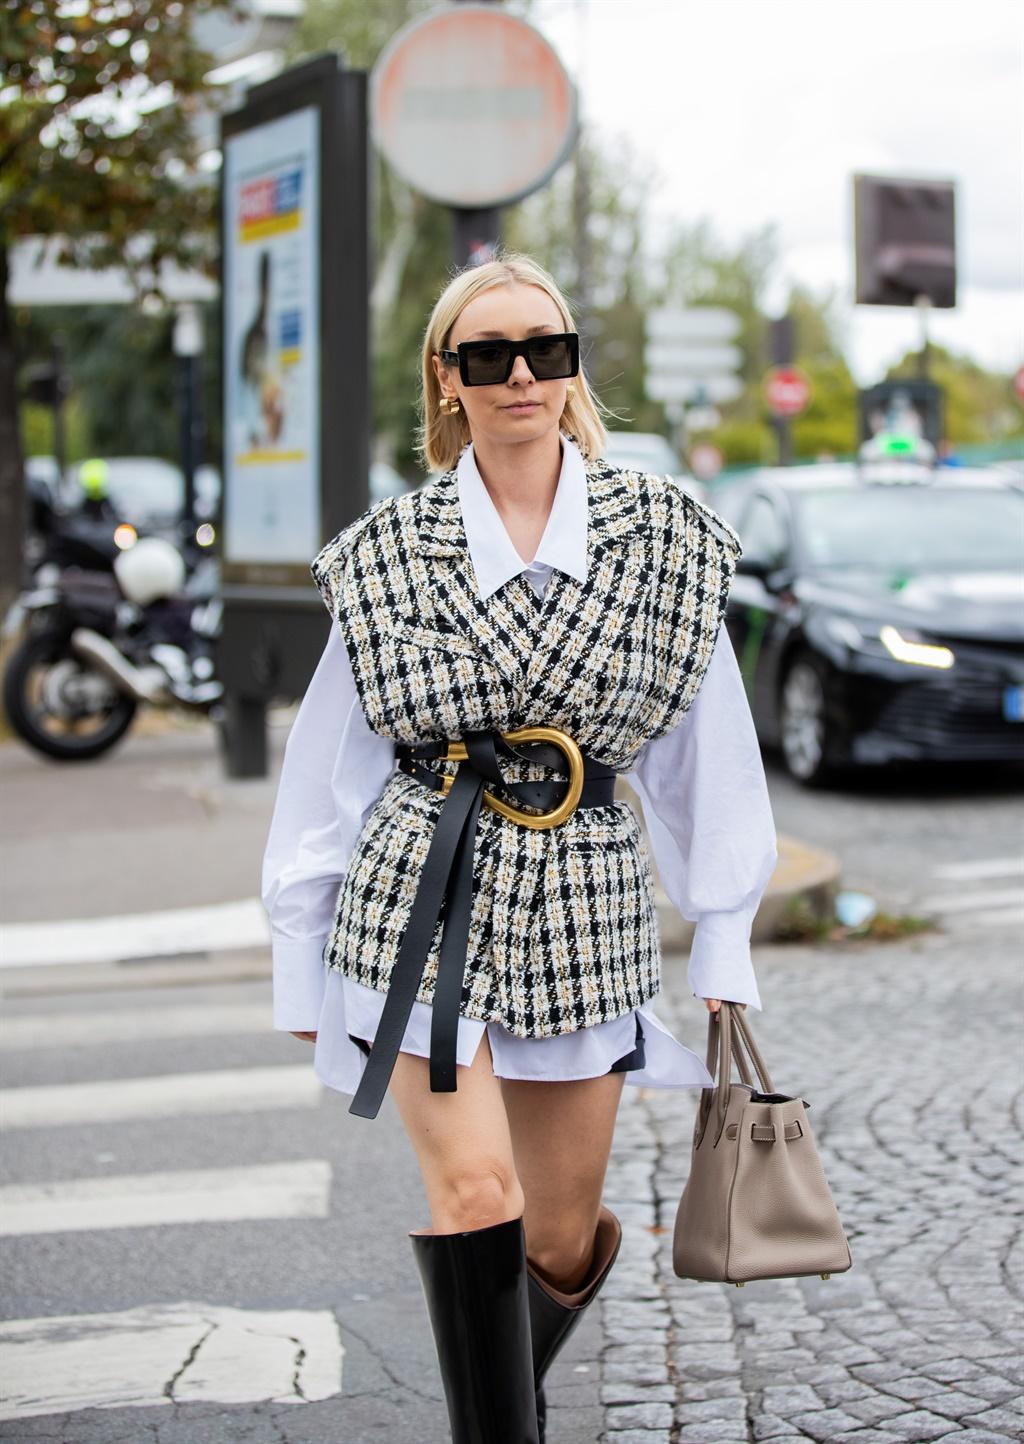 PARIS, FRANCE - OCTOBER 04: Maria Bernad seen wear